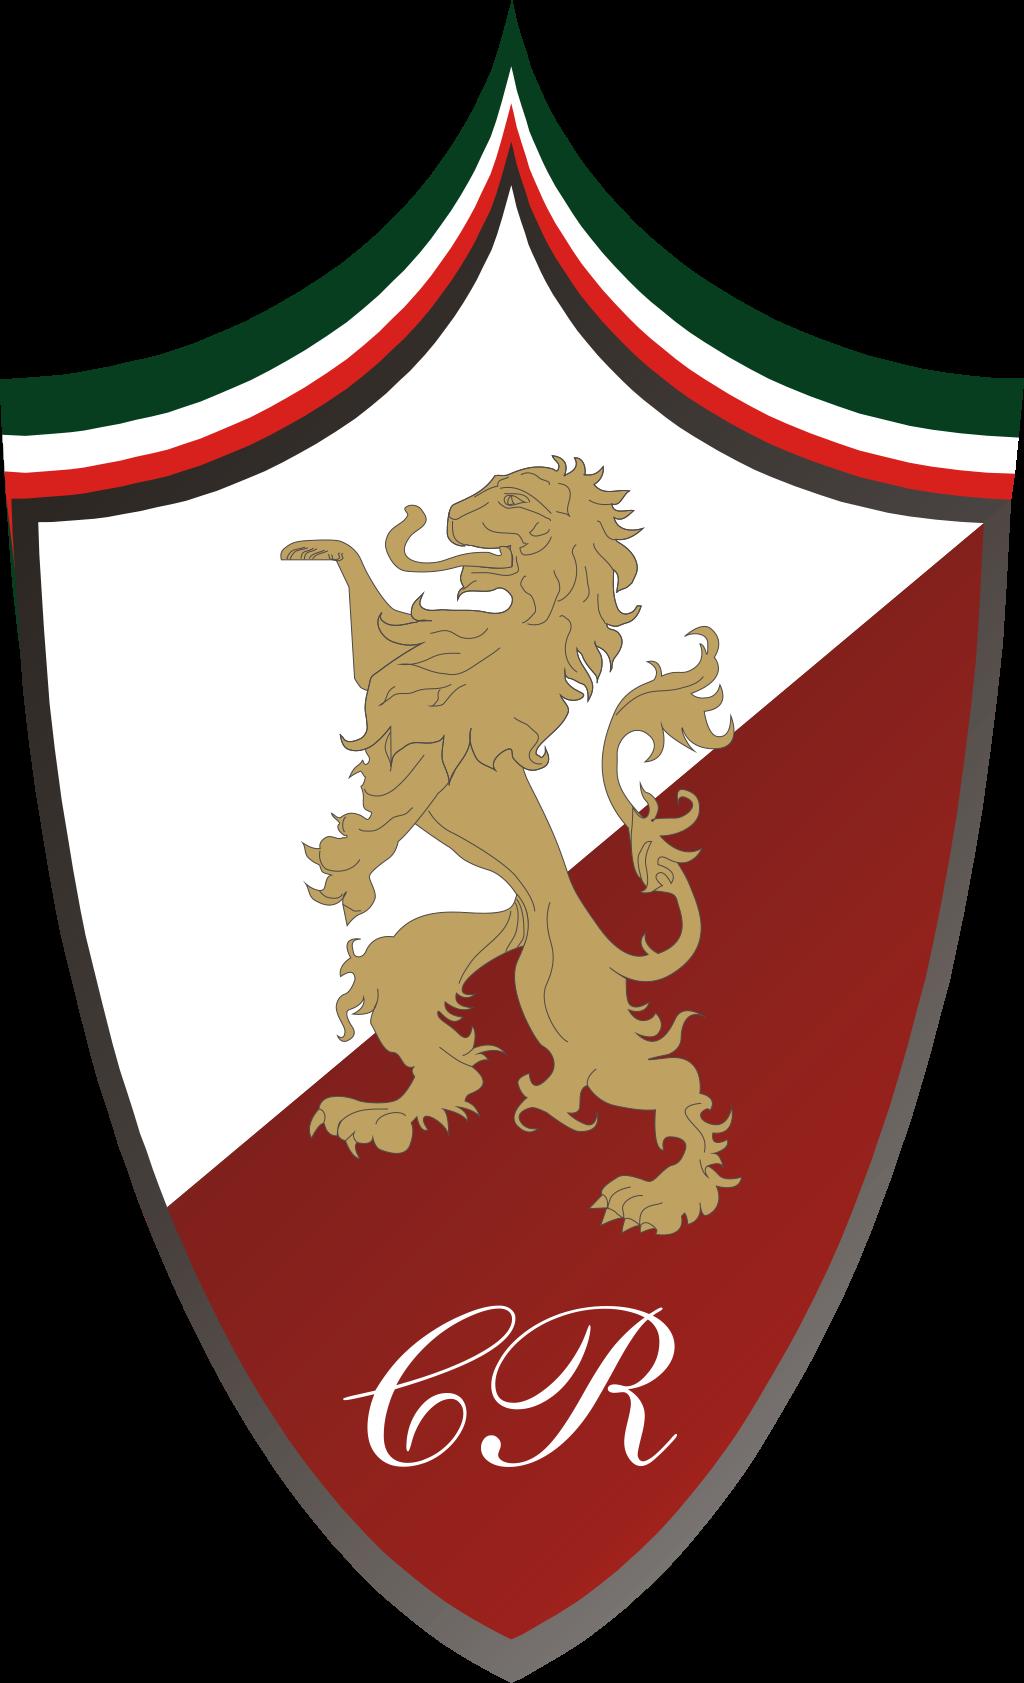 CostaRossa